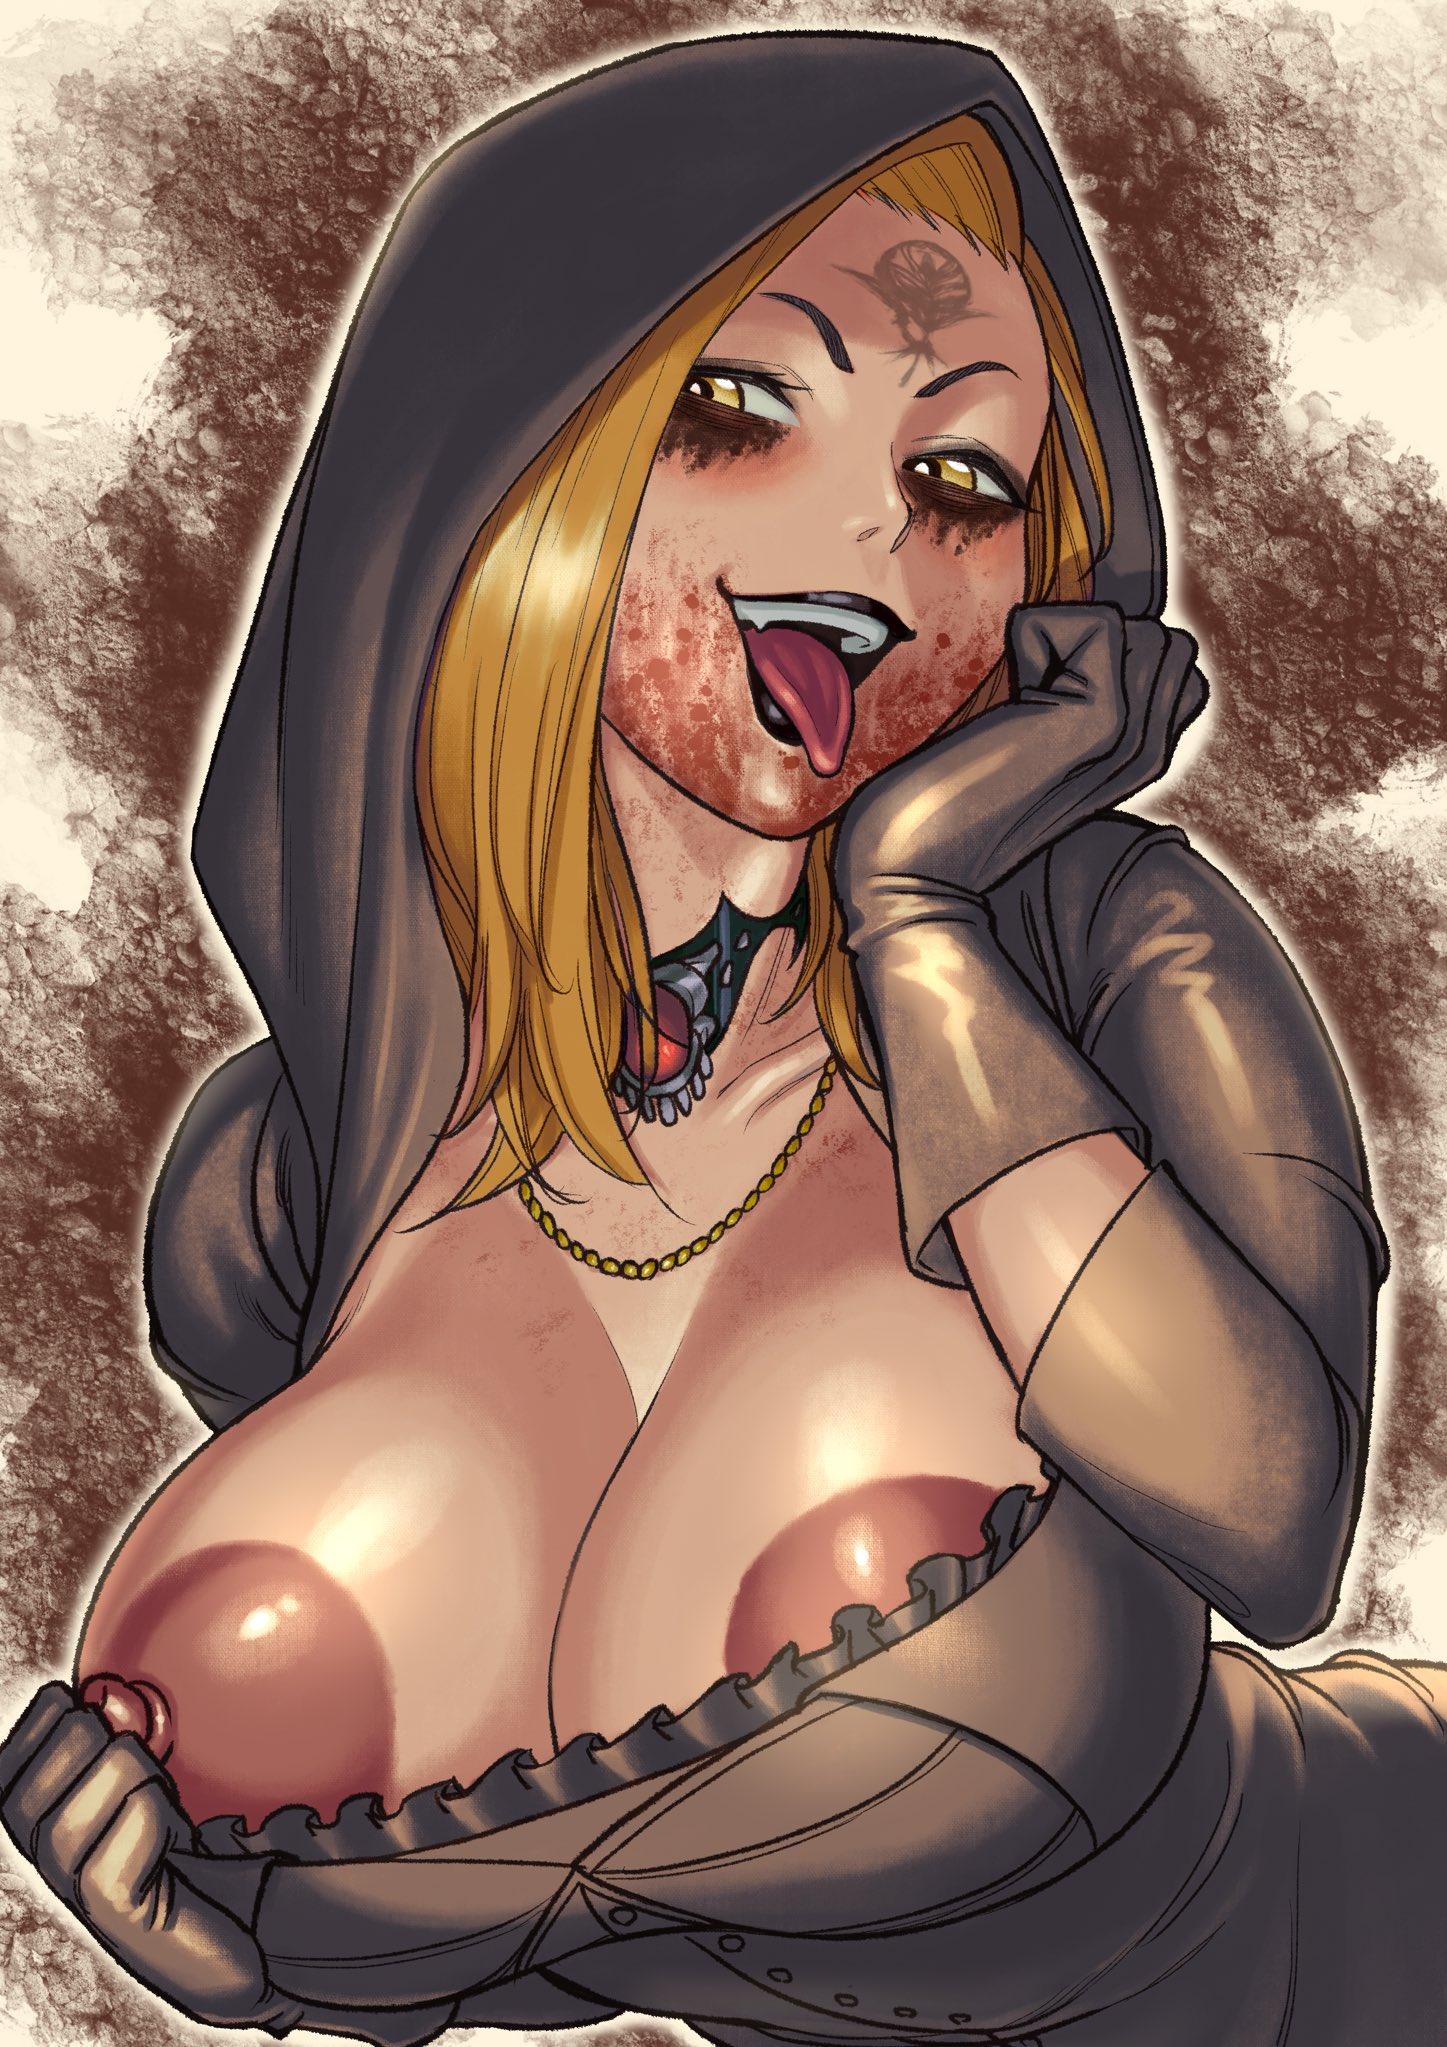 Guuerosu - Daniela Resident Evil 8 Village Porn